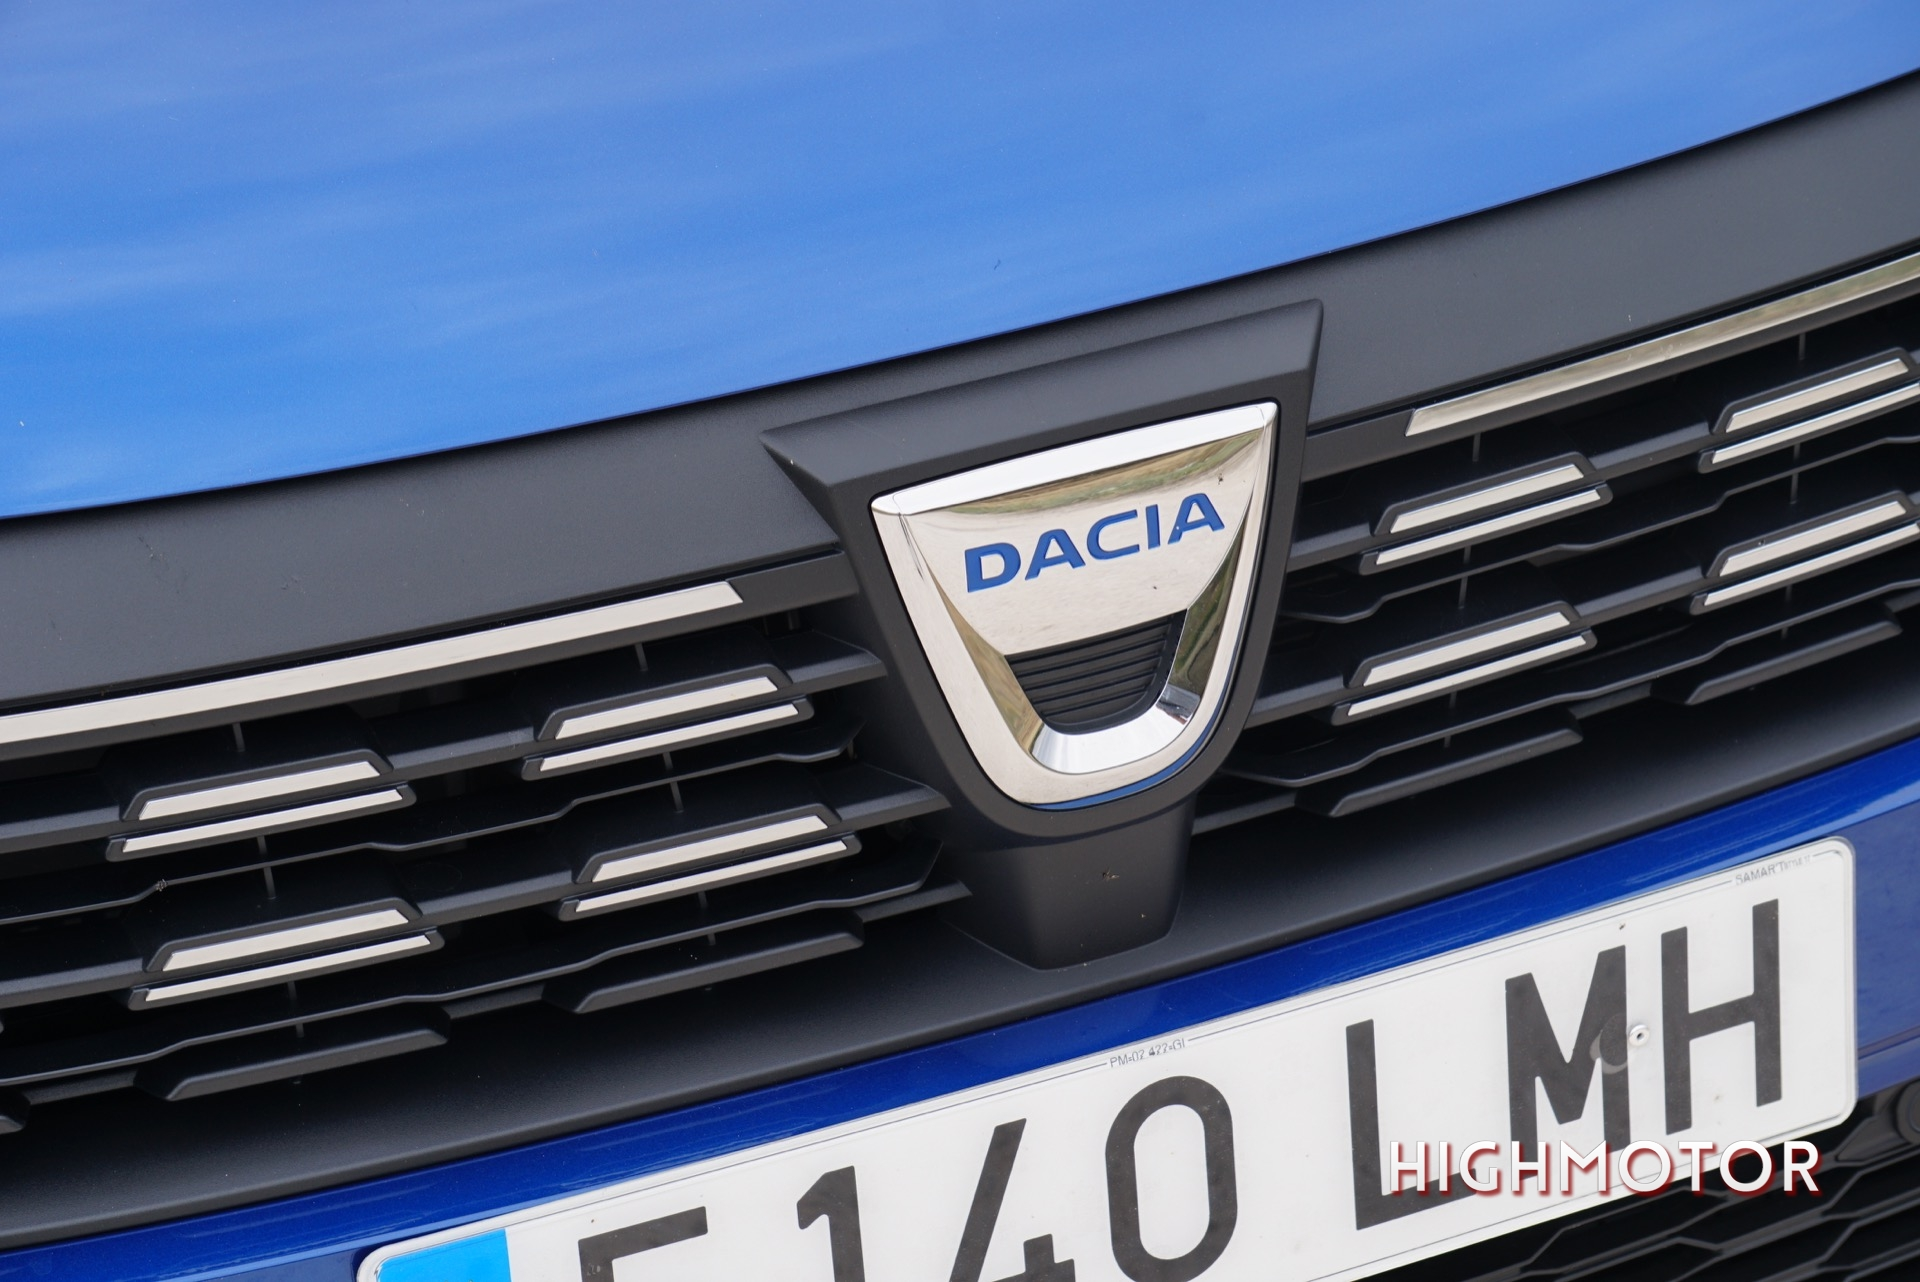 Dacia Sandero Glp 5